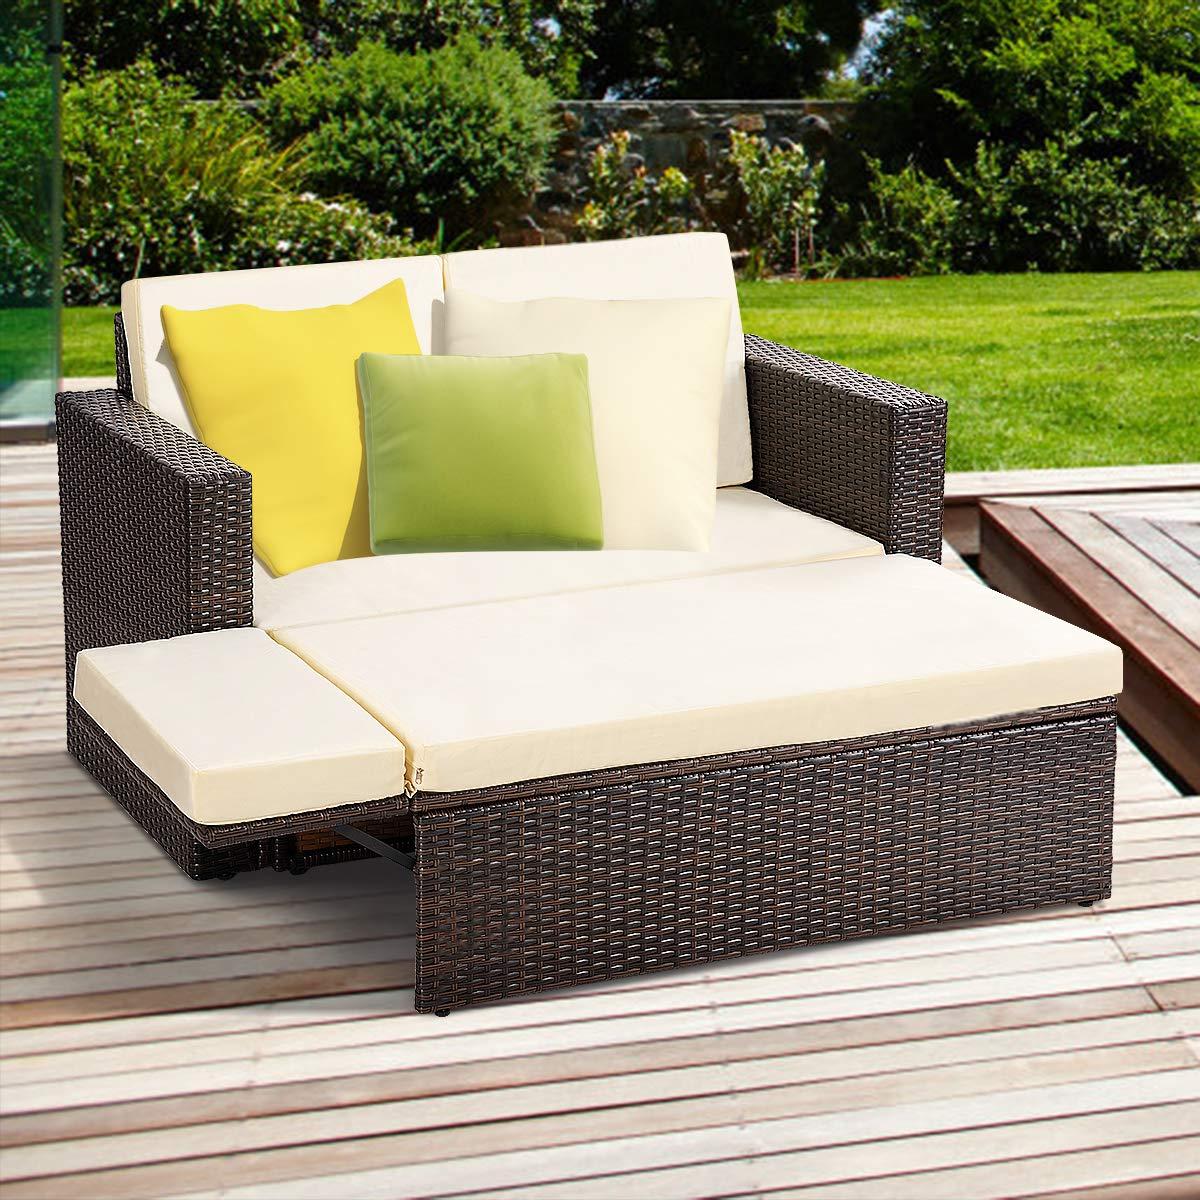 Amazon.com: TANGKULA - Juego de sofá de mimbre para patio al ...